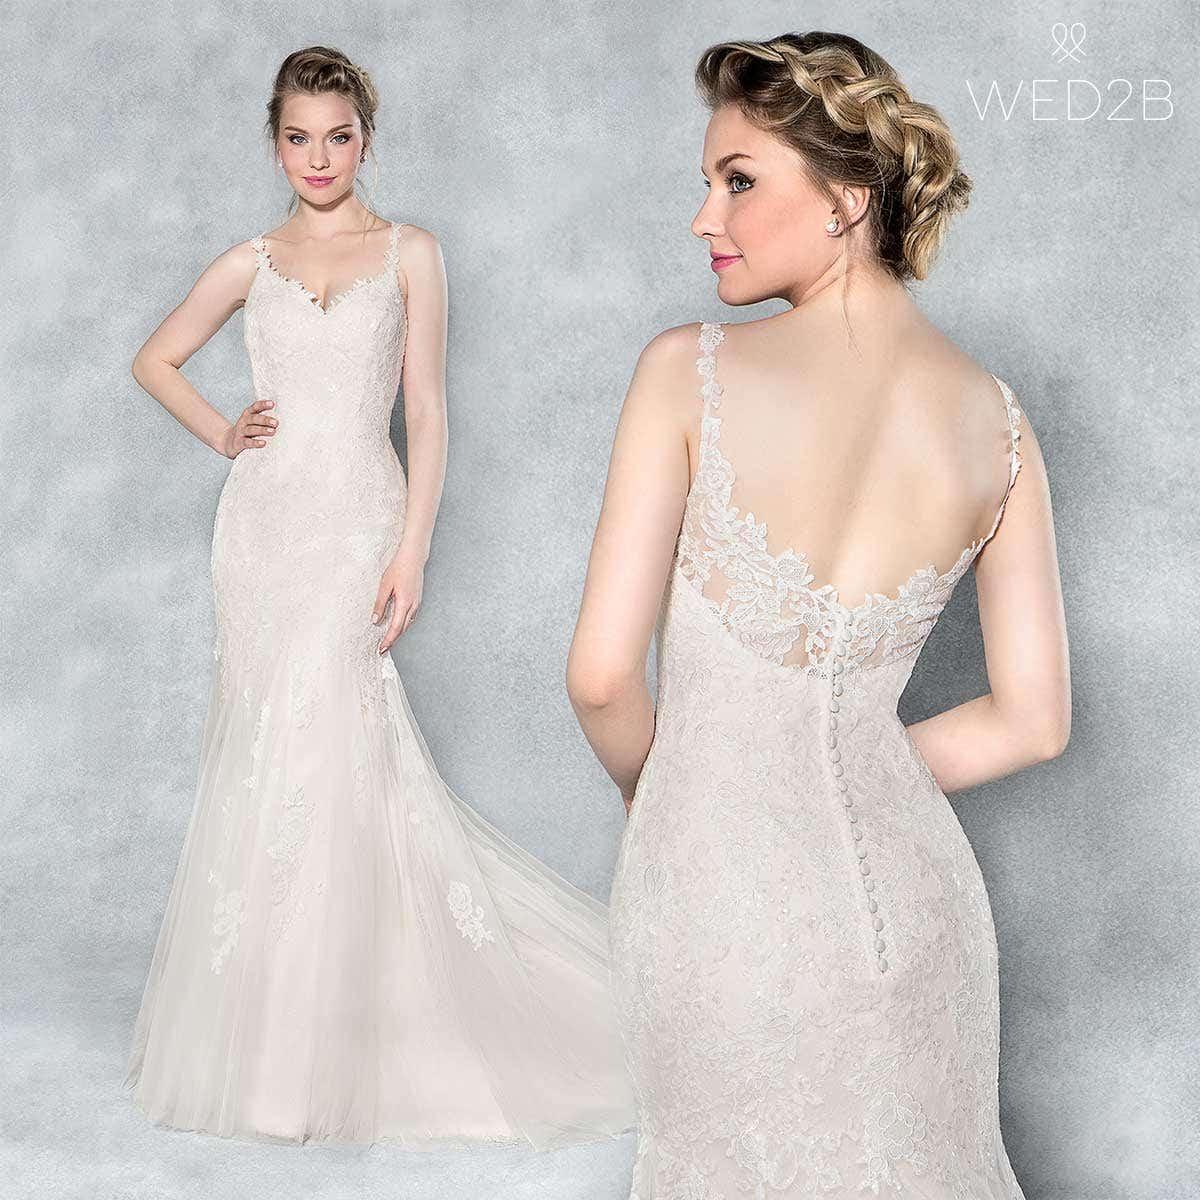 Non Traditional Fall Wedding Dresses: The Prettiest Blush Wedding Dresses